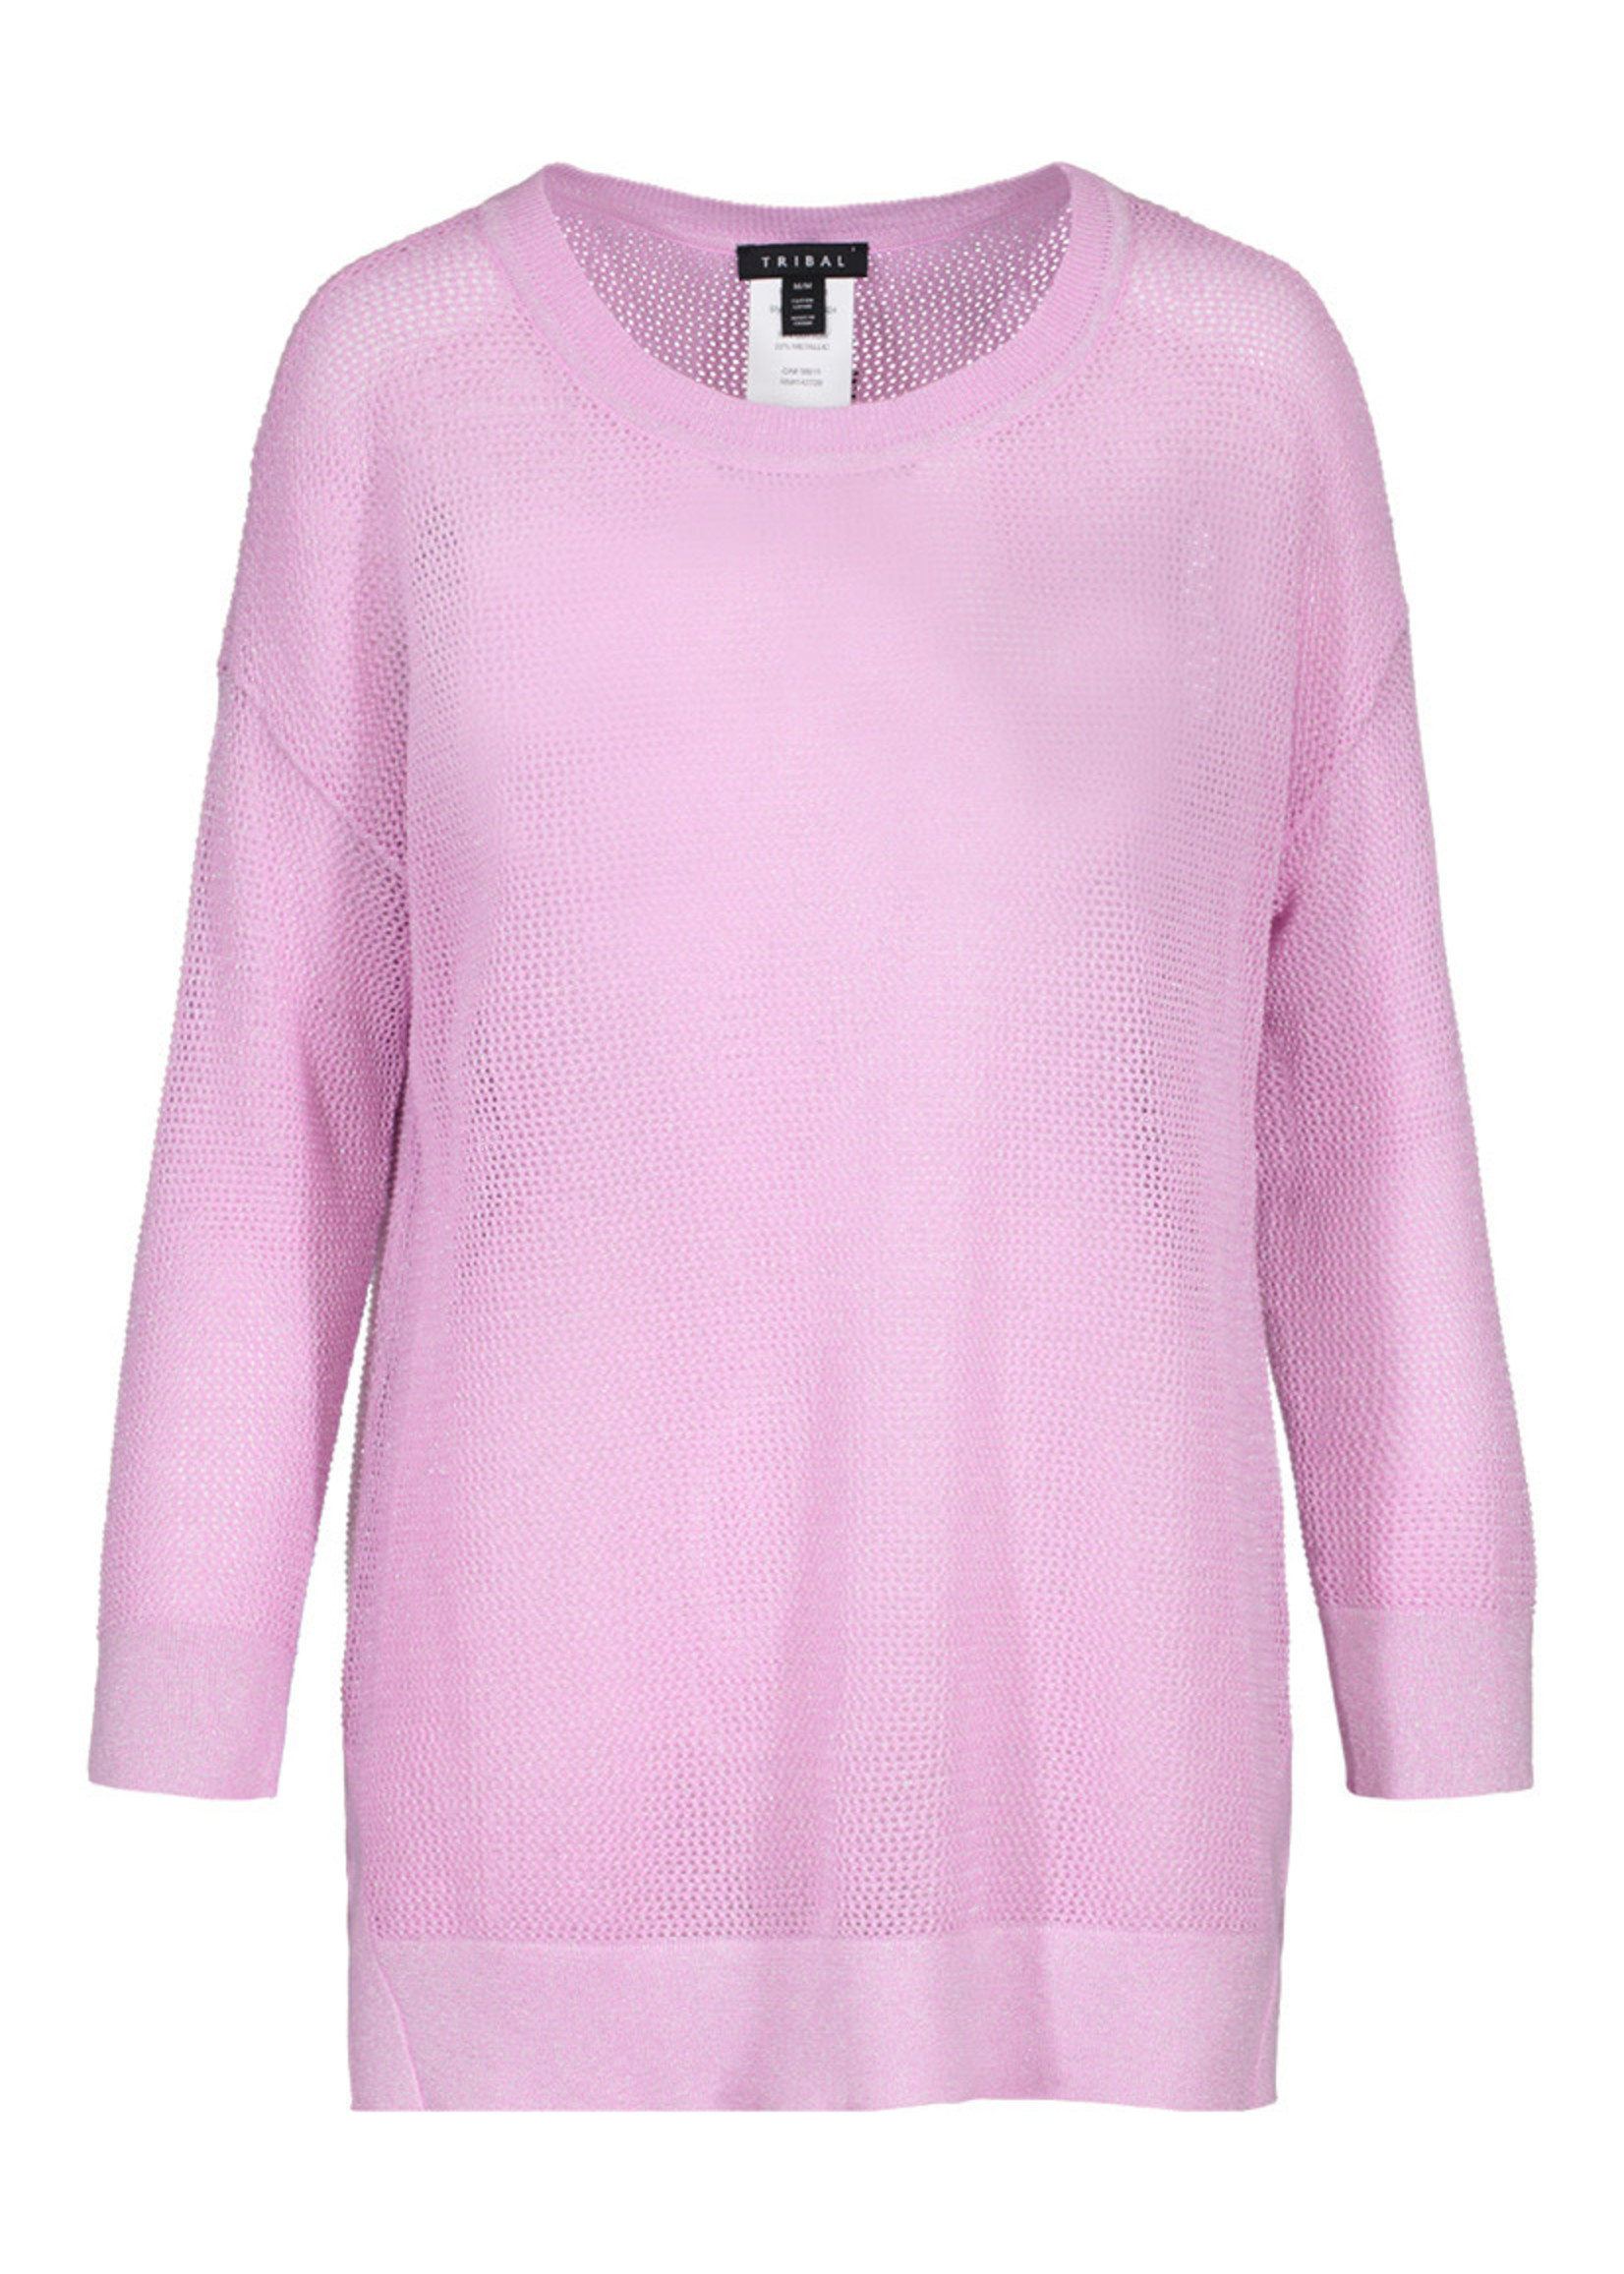 Tribal 36830 2924 3/4 Sleeve Lurex Sweater